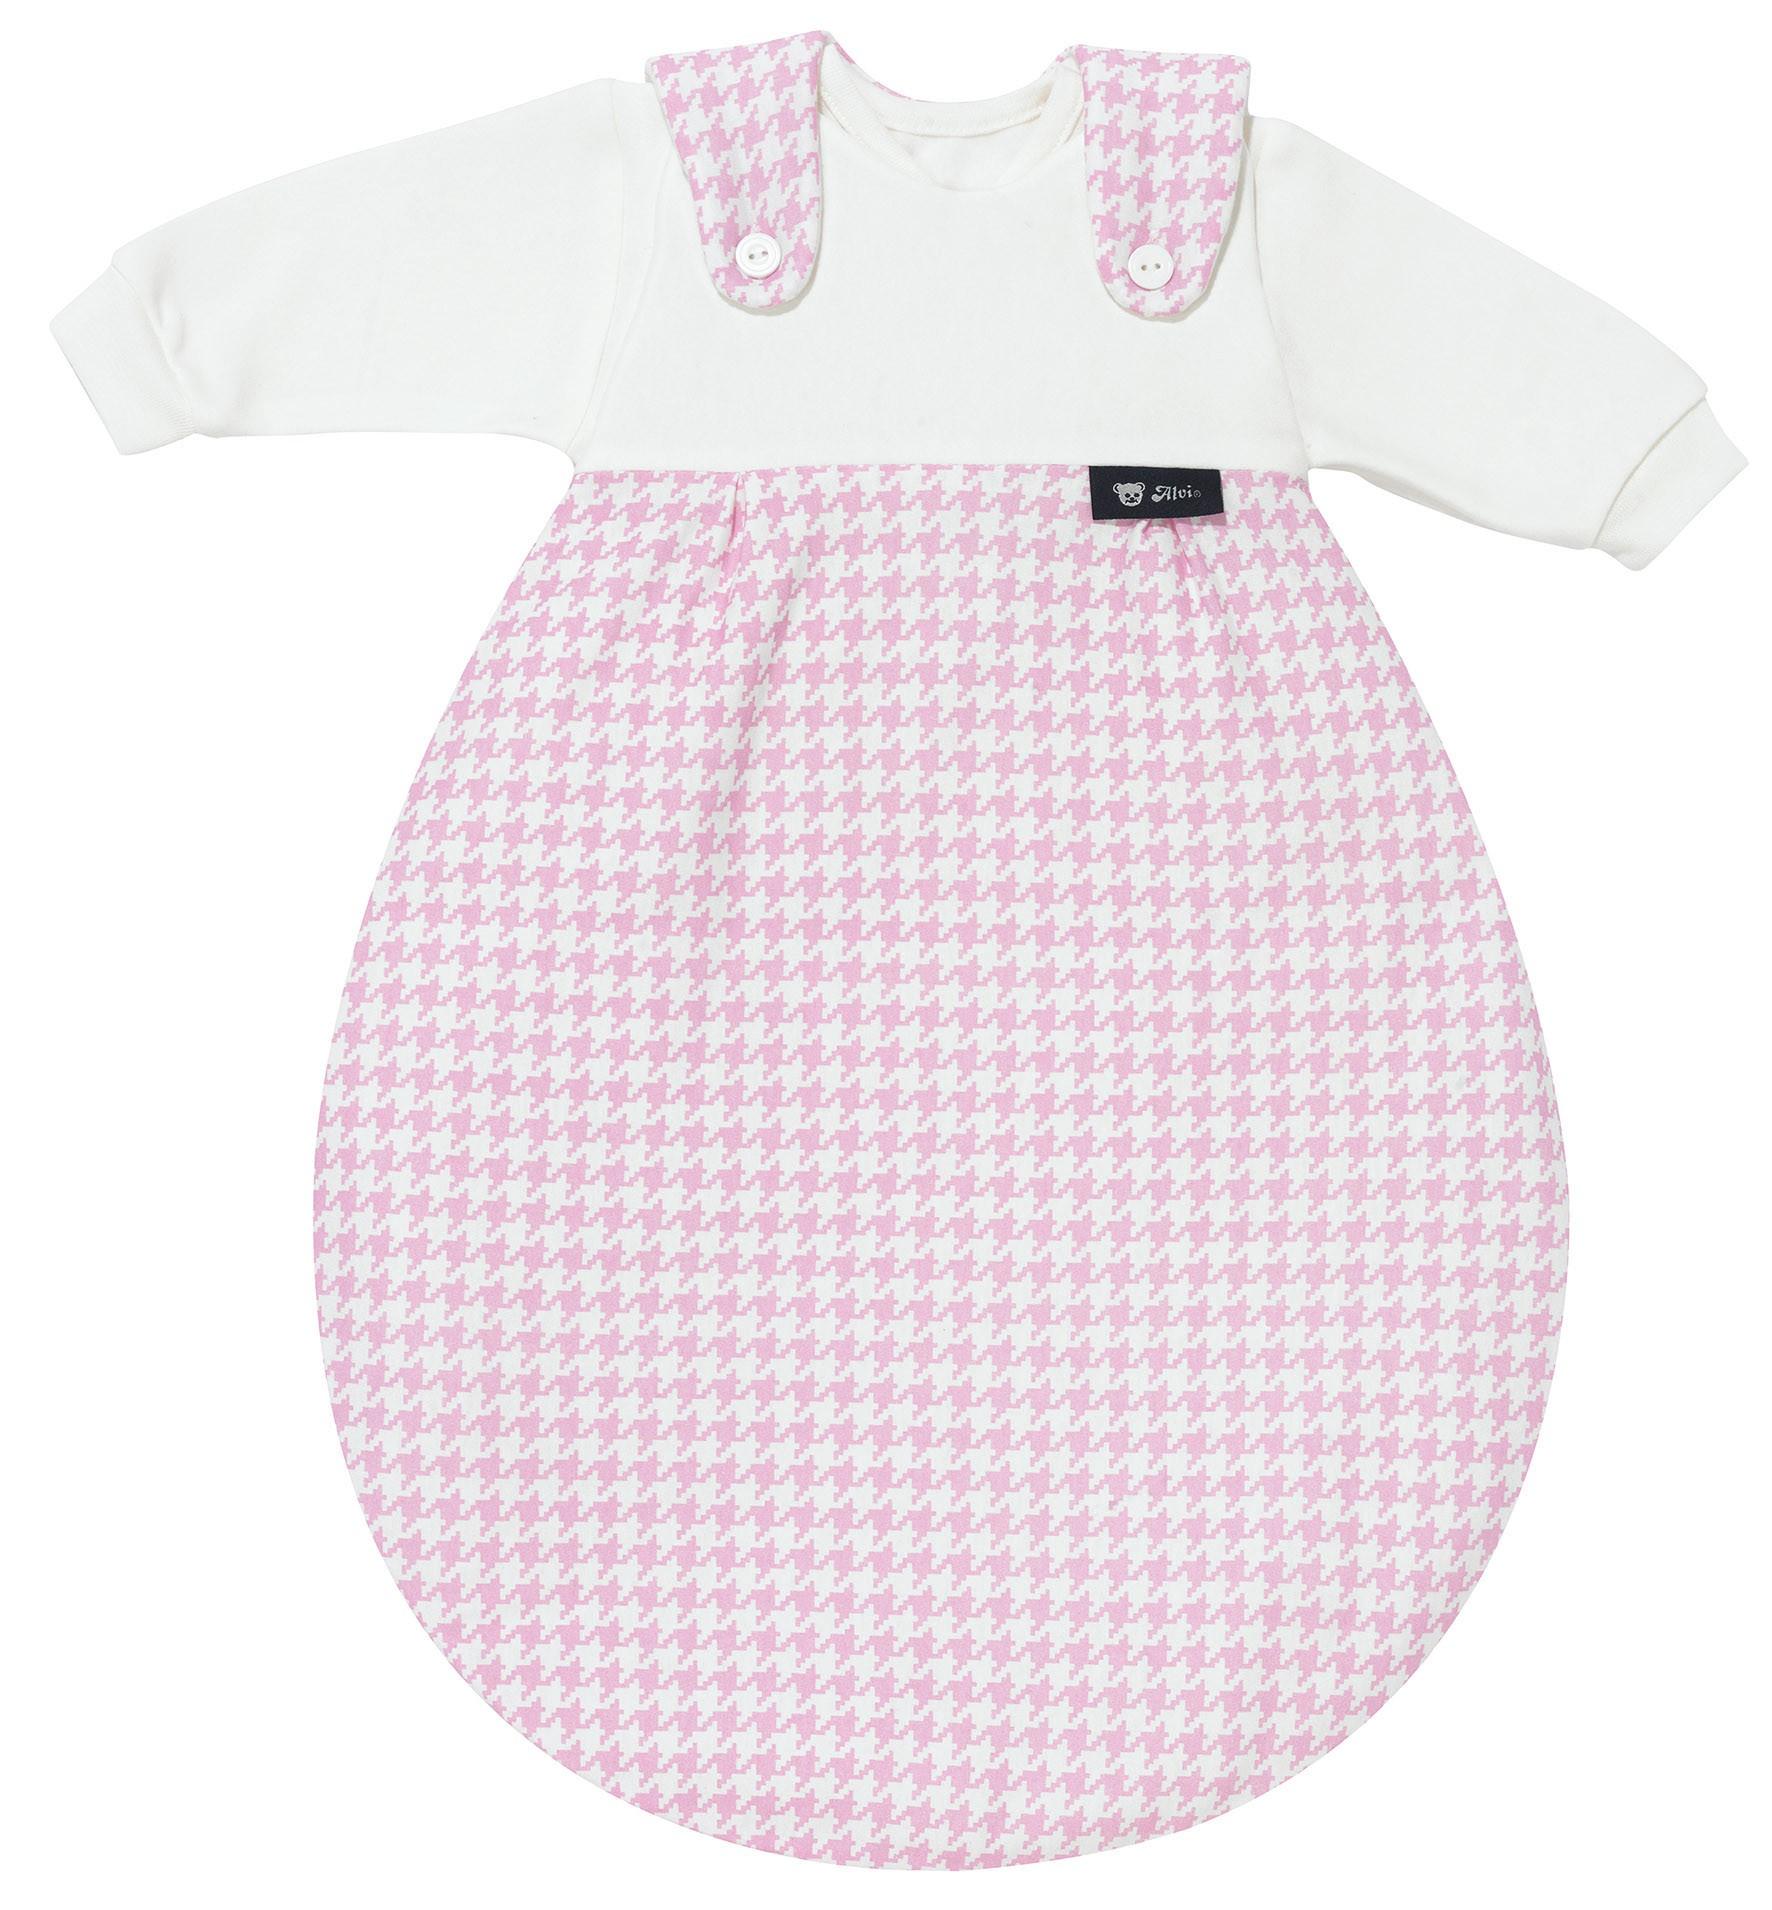 Alvi Baby Mäxchen 3tlg. Pepita rosa 567-2